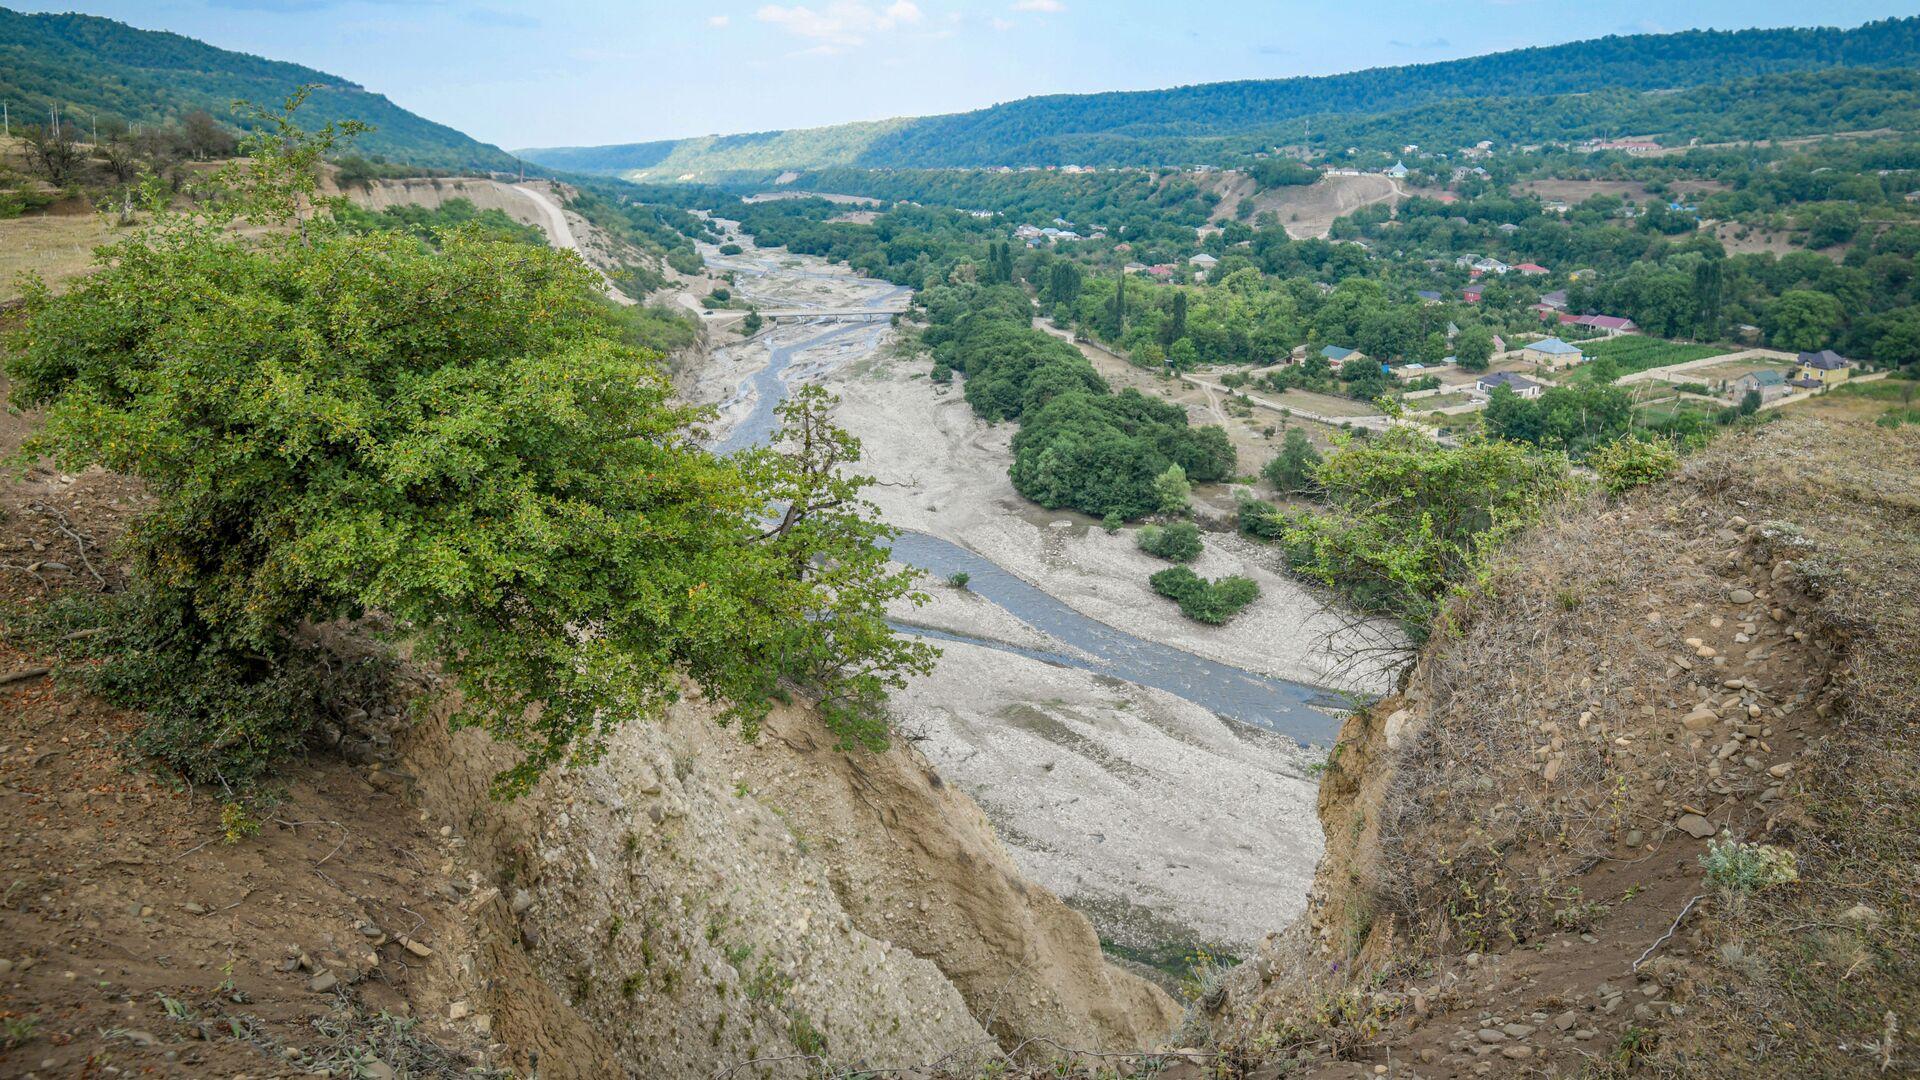 Река в городе Гусар - Sputnik Азербайджан, 1920, 16.09.2021